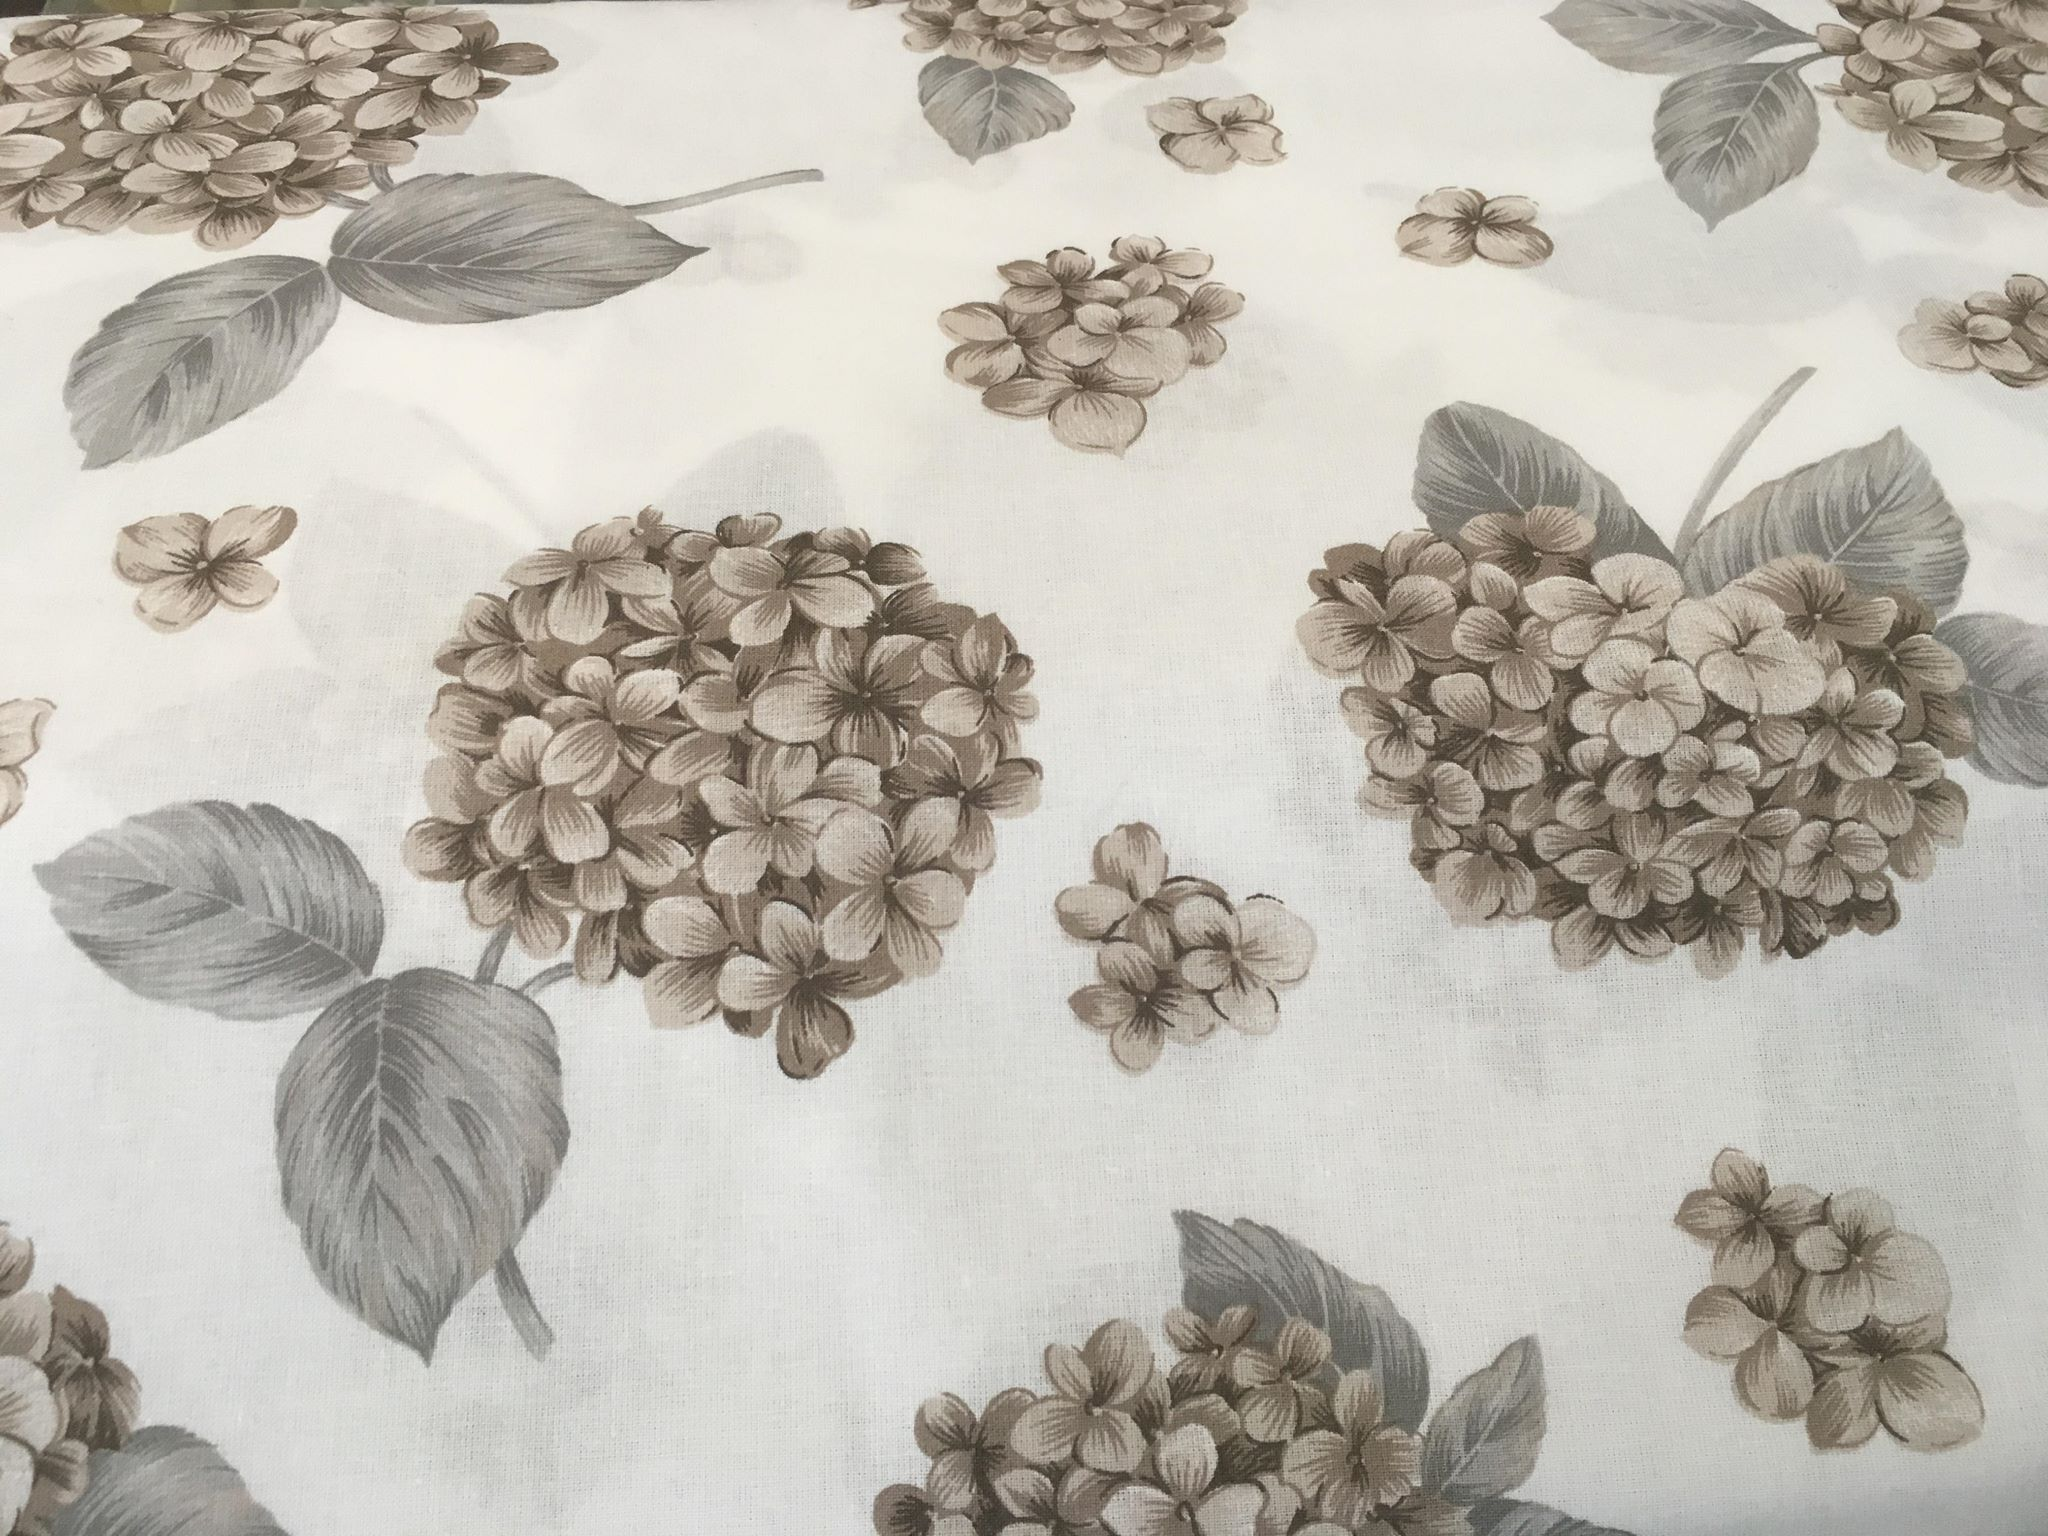 d05813ff1fb1 Bavlnená kolekcia hortenzie hnedé empty